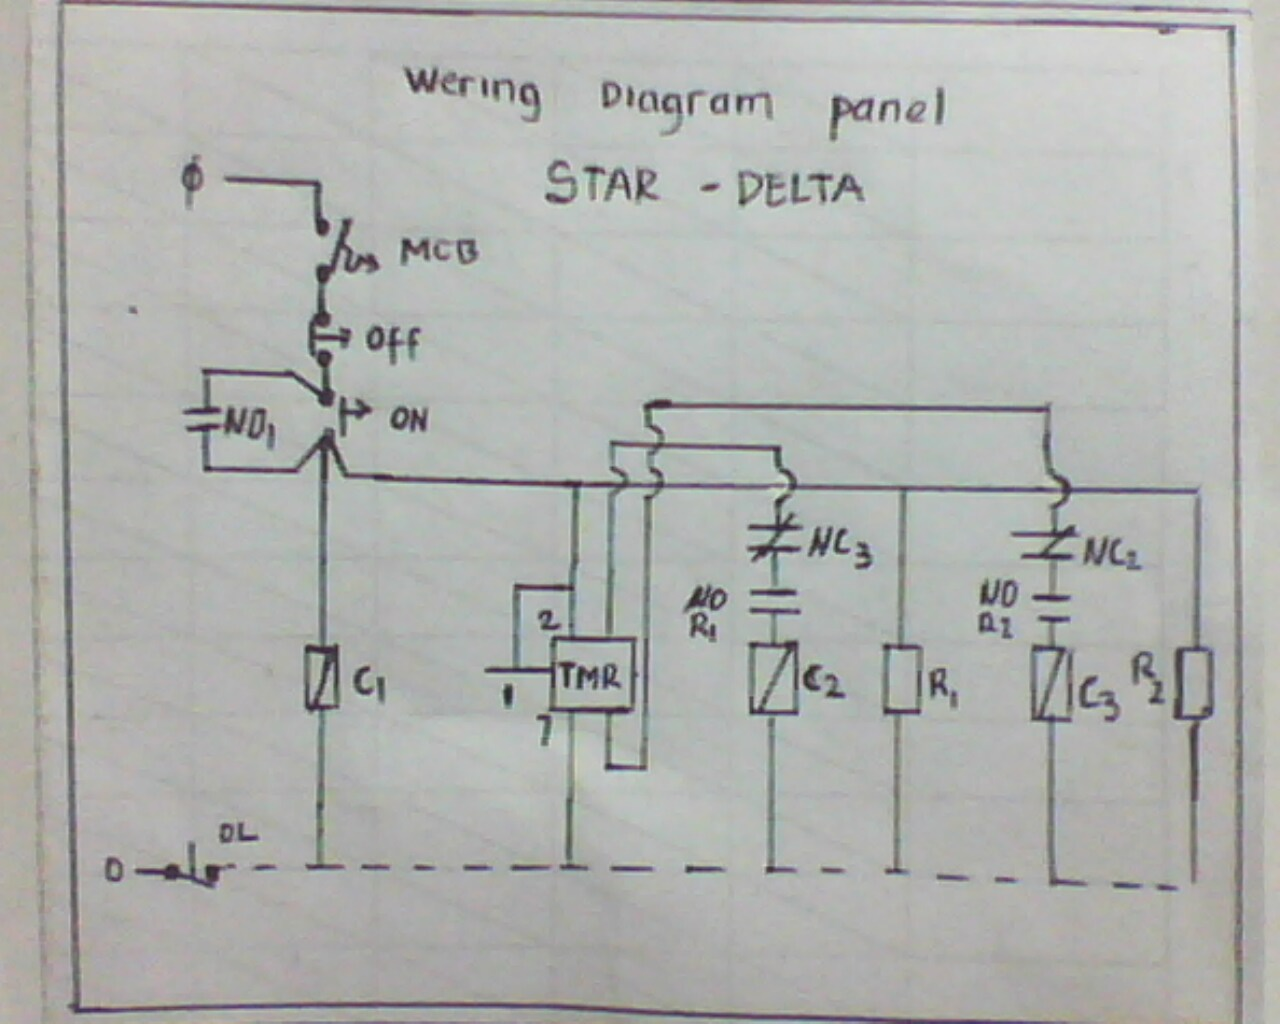 Installation of electrical panels (instalasi panel listrik